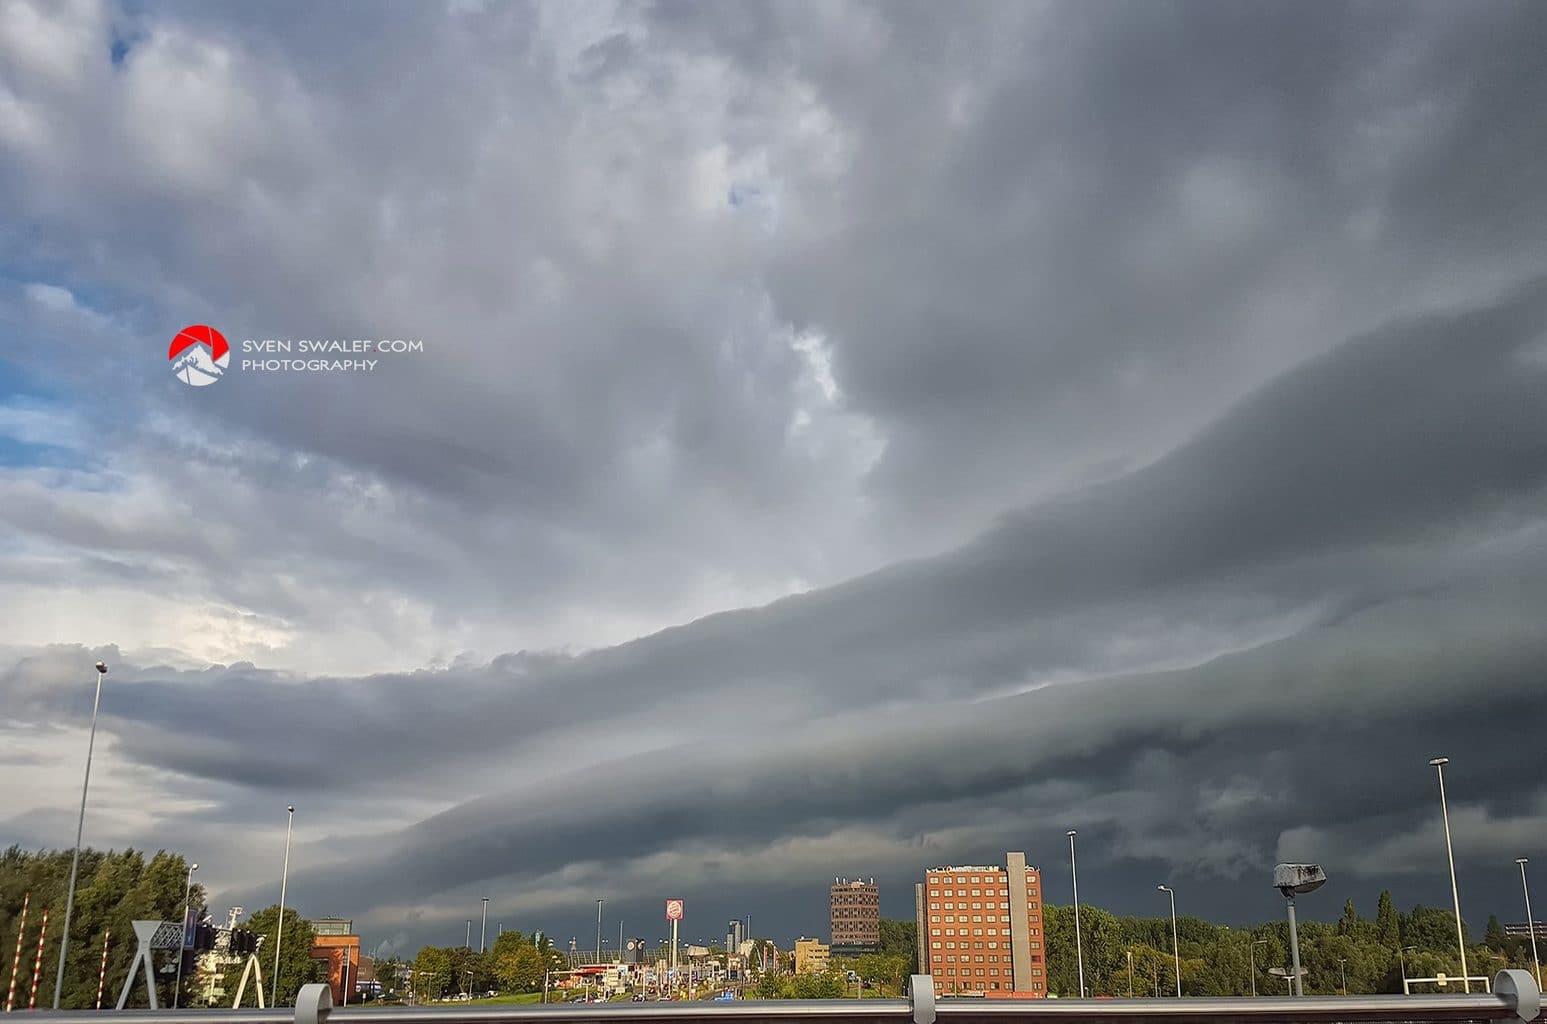 Shelfcloud taking over the city of Vlaardingen (Netherlands) on the 3'th of September!